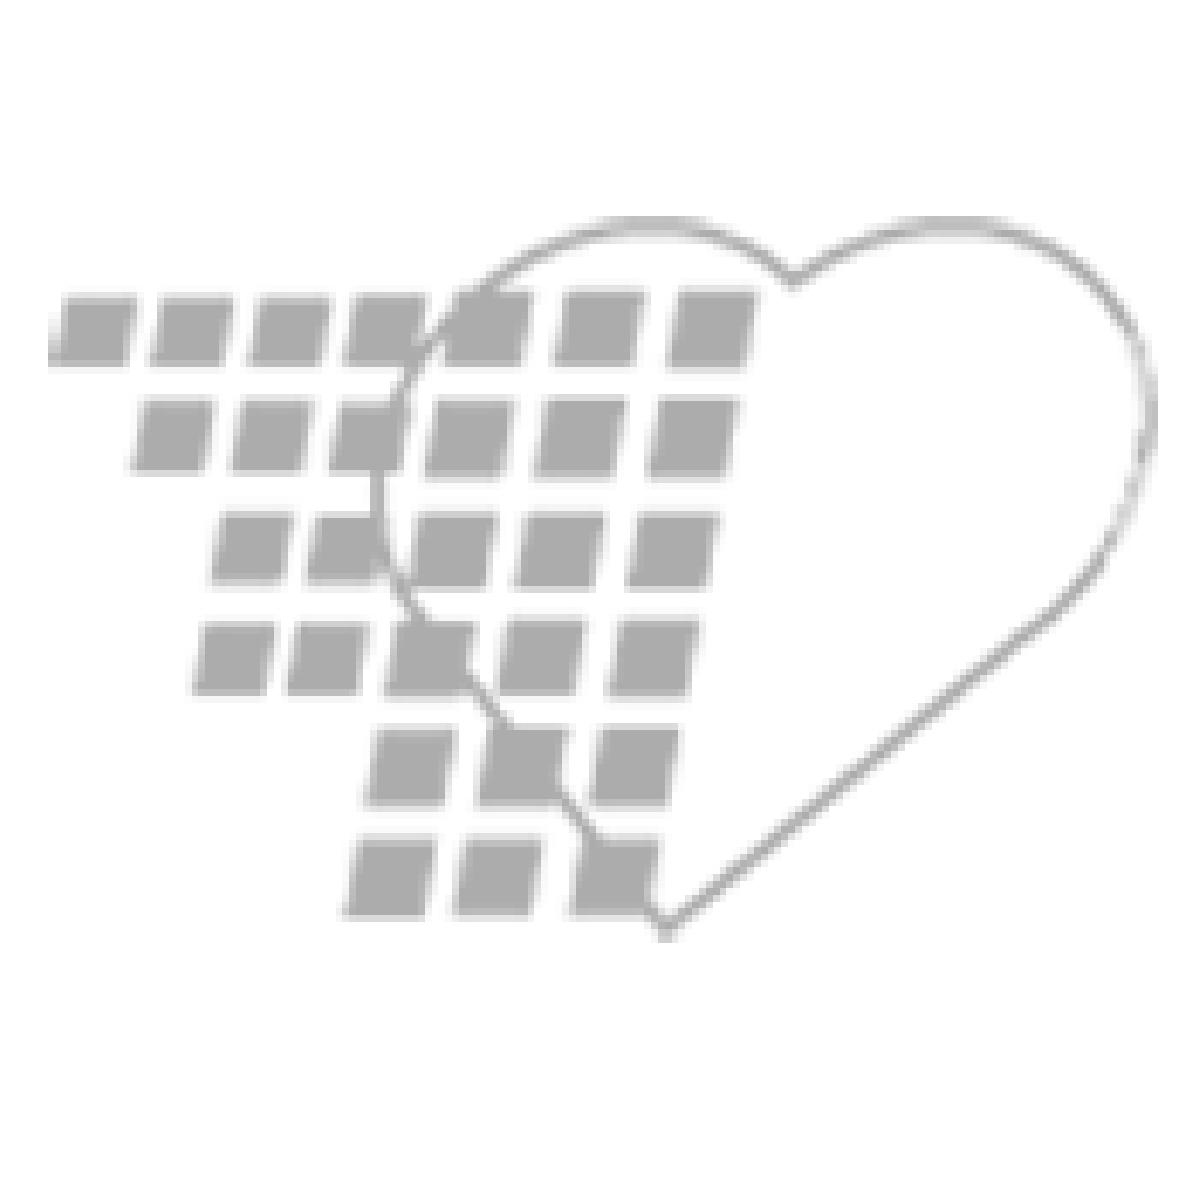 07-71-4603 Pocket Nurse® Tracheostomy Care Kit with 14 Fr Catheter Latex Free